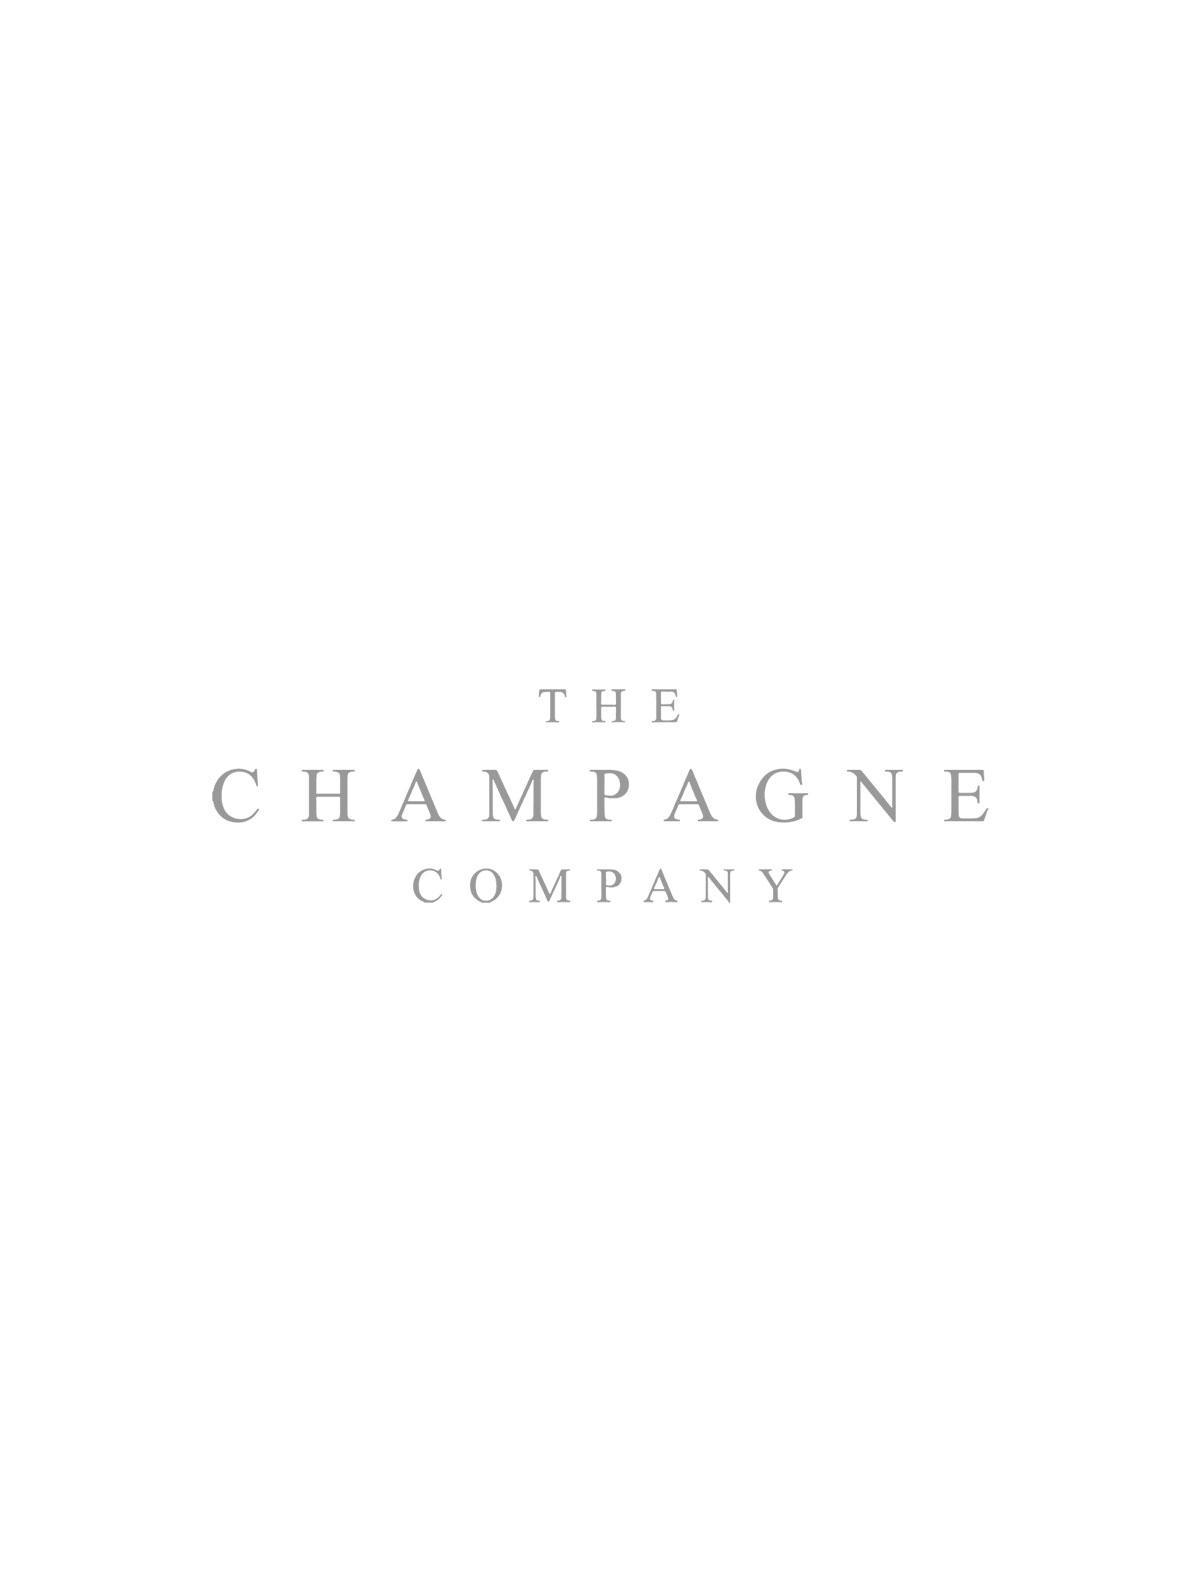 Stonecroft Hawkes Bay Ruhanui 2013 Cabernet Sauvignon Red Wine 75cl